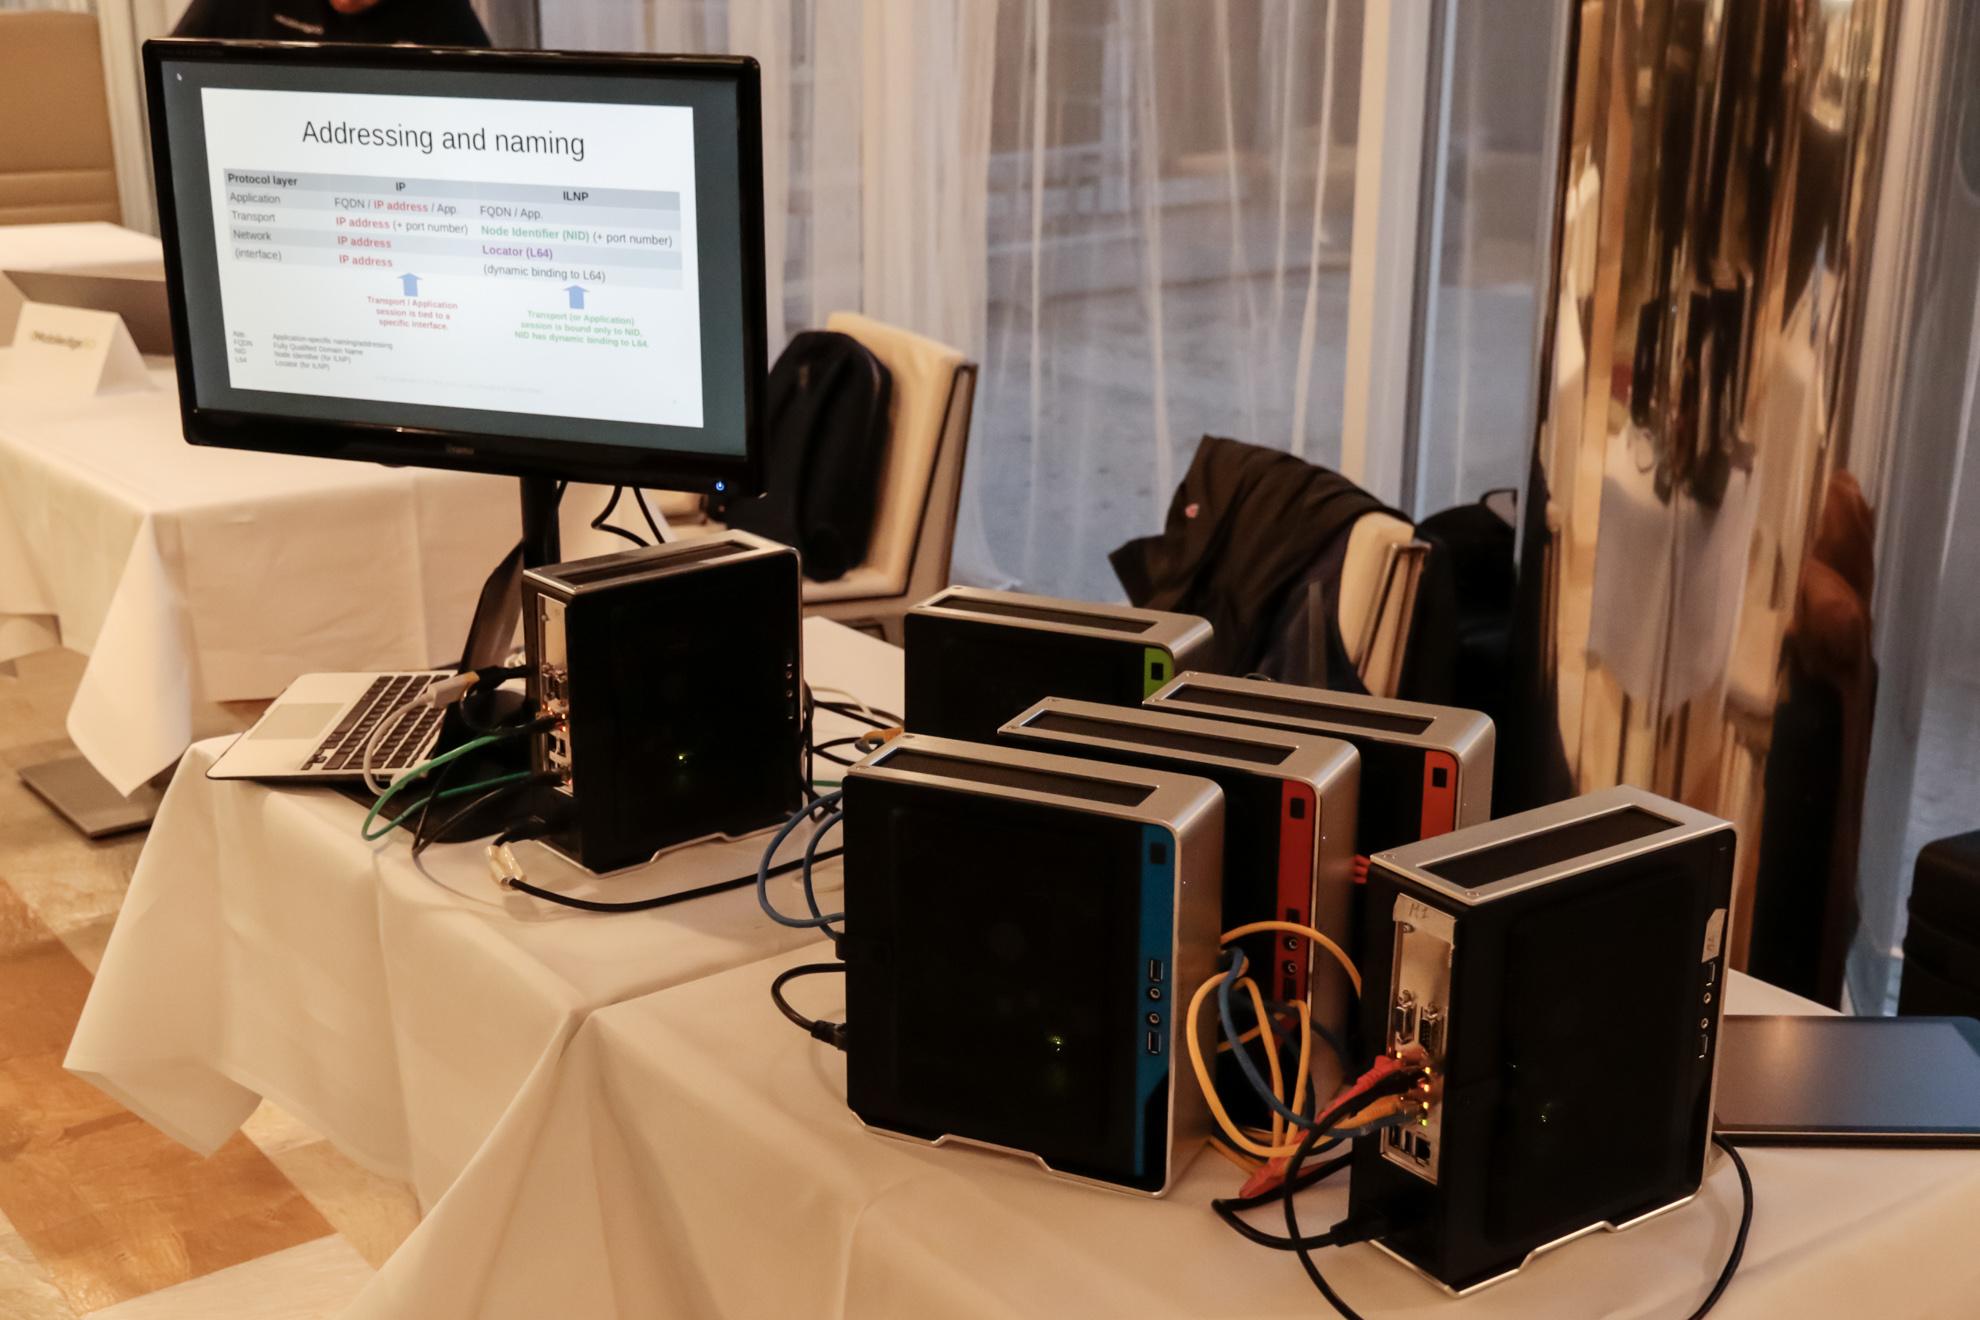 Netdev での デモ機材がテーブルに並んでいる様子。